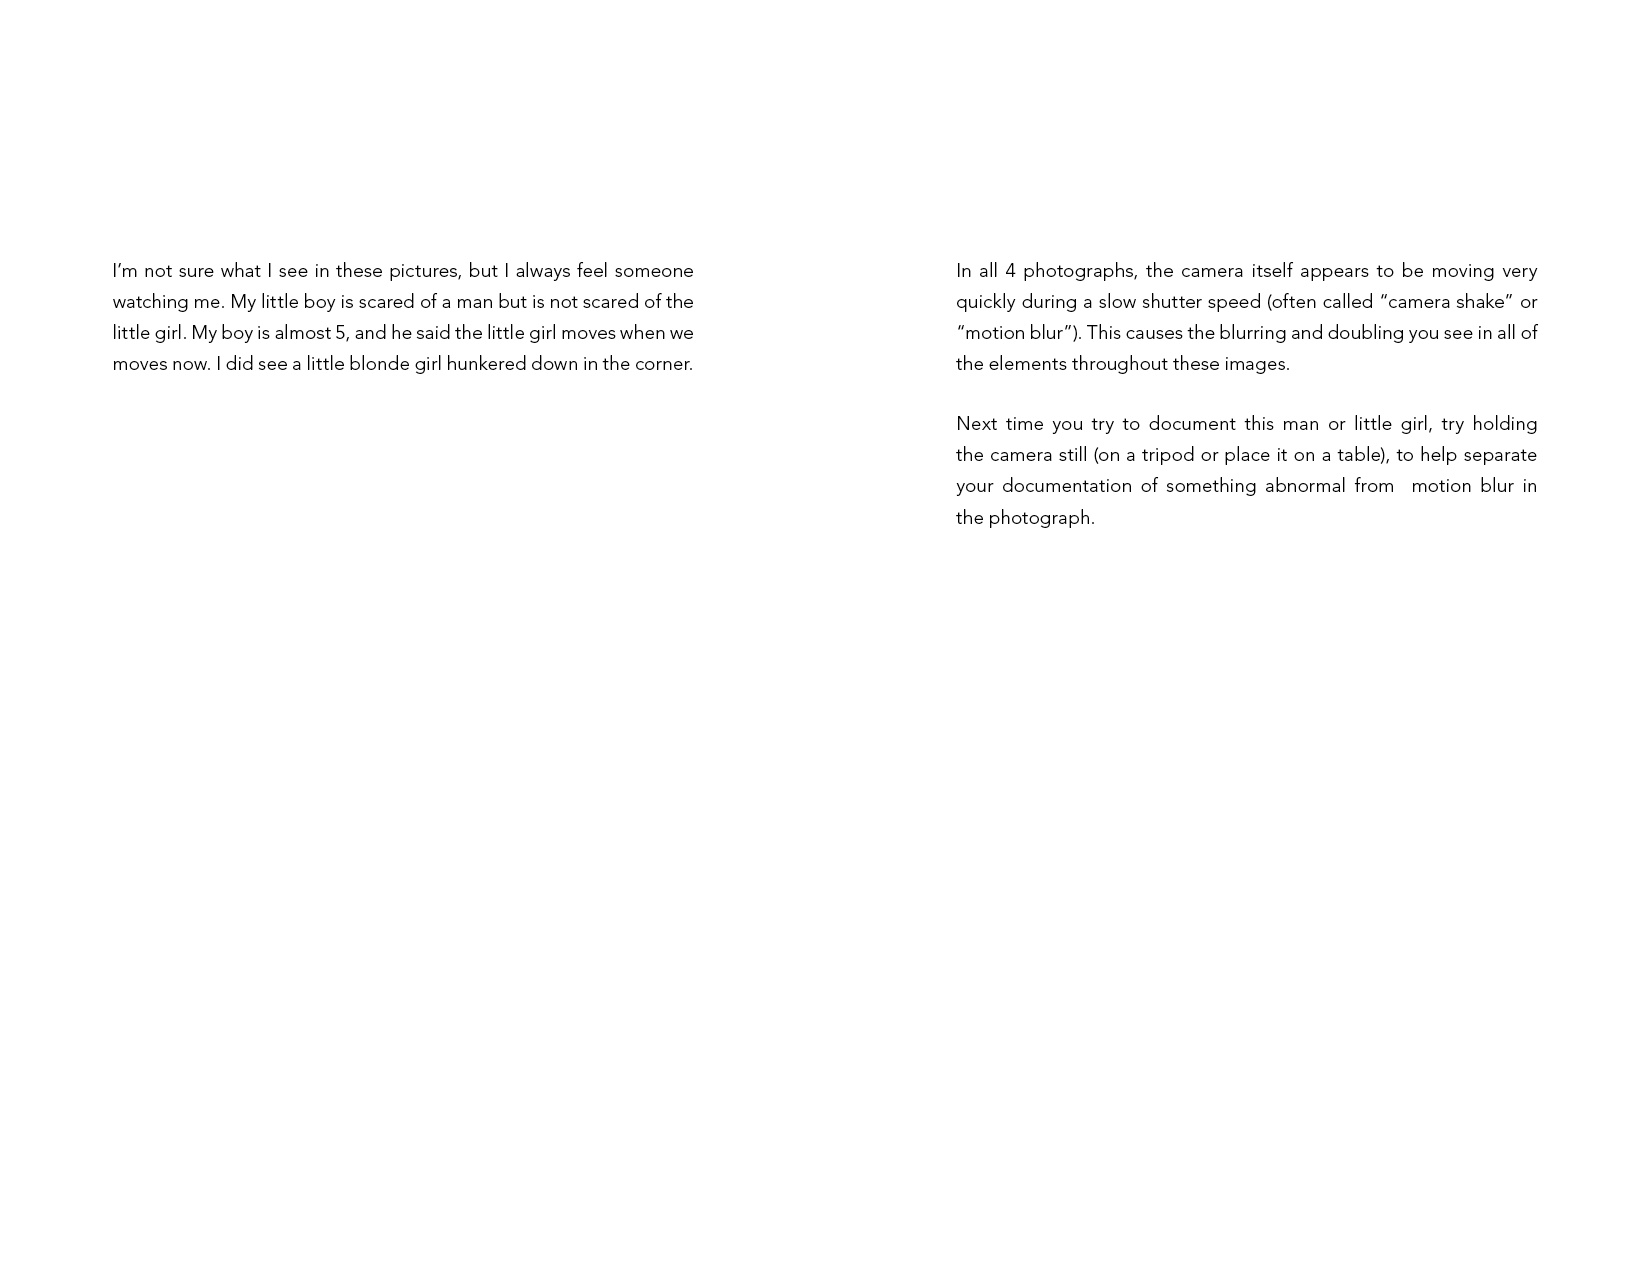 ElizabethMoran_Correspondence1_pages13.png